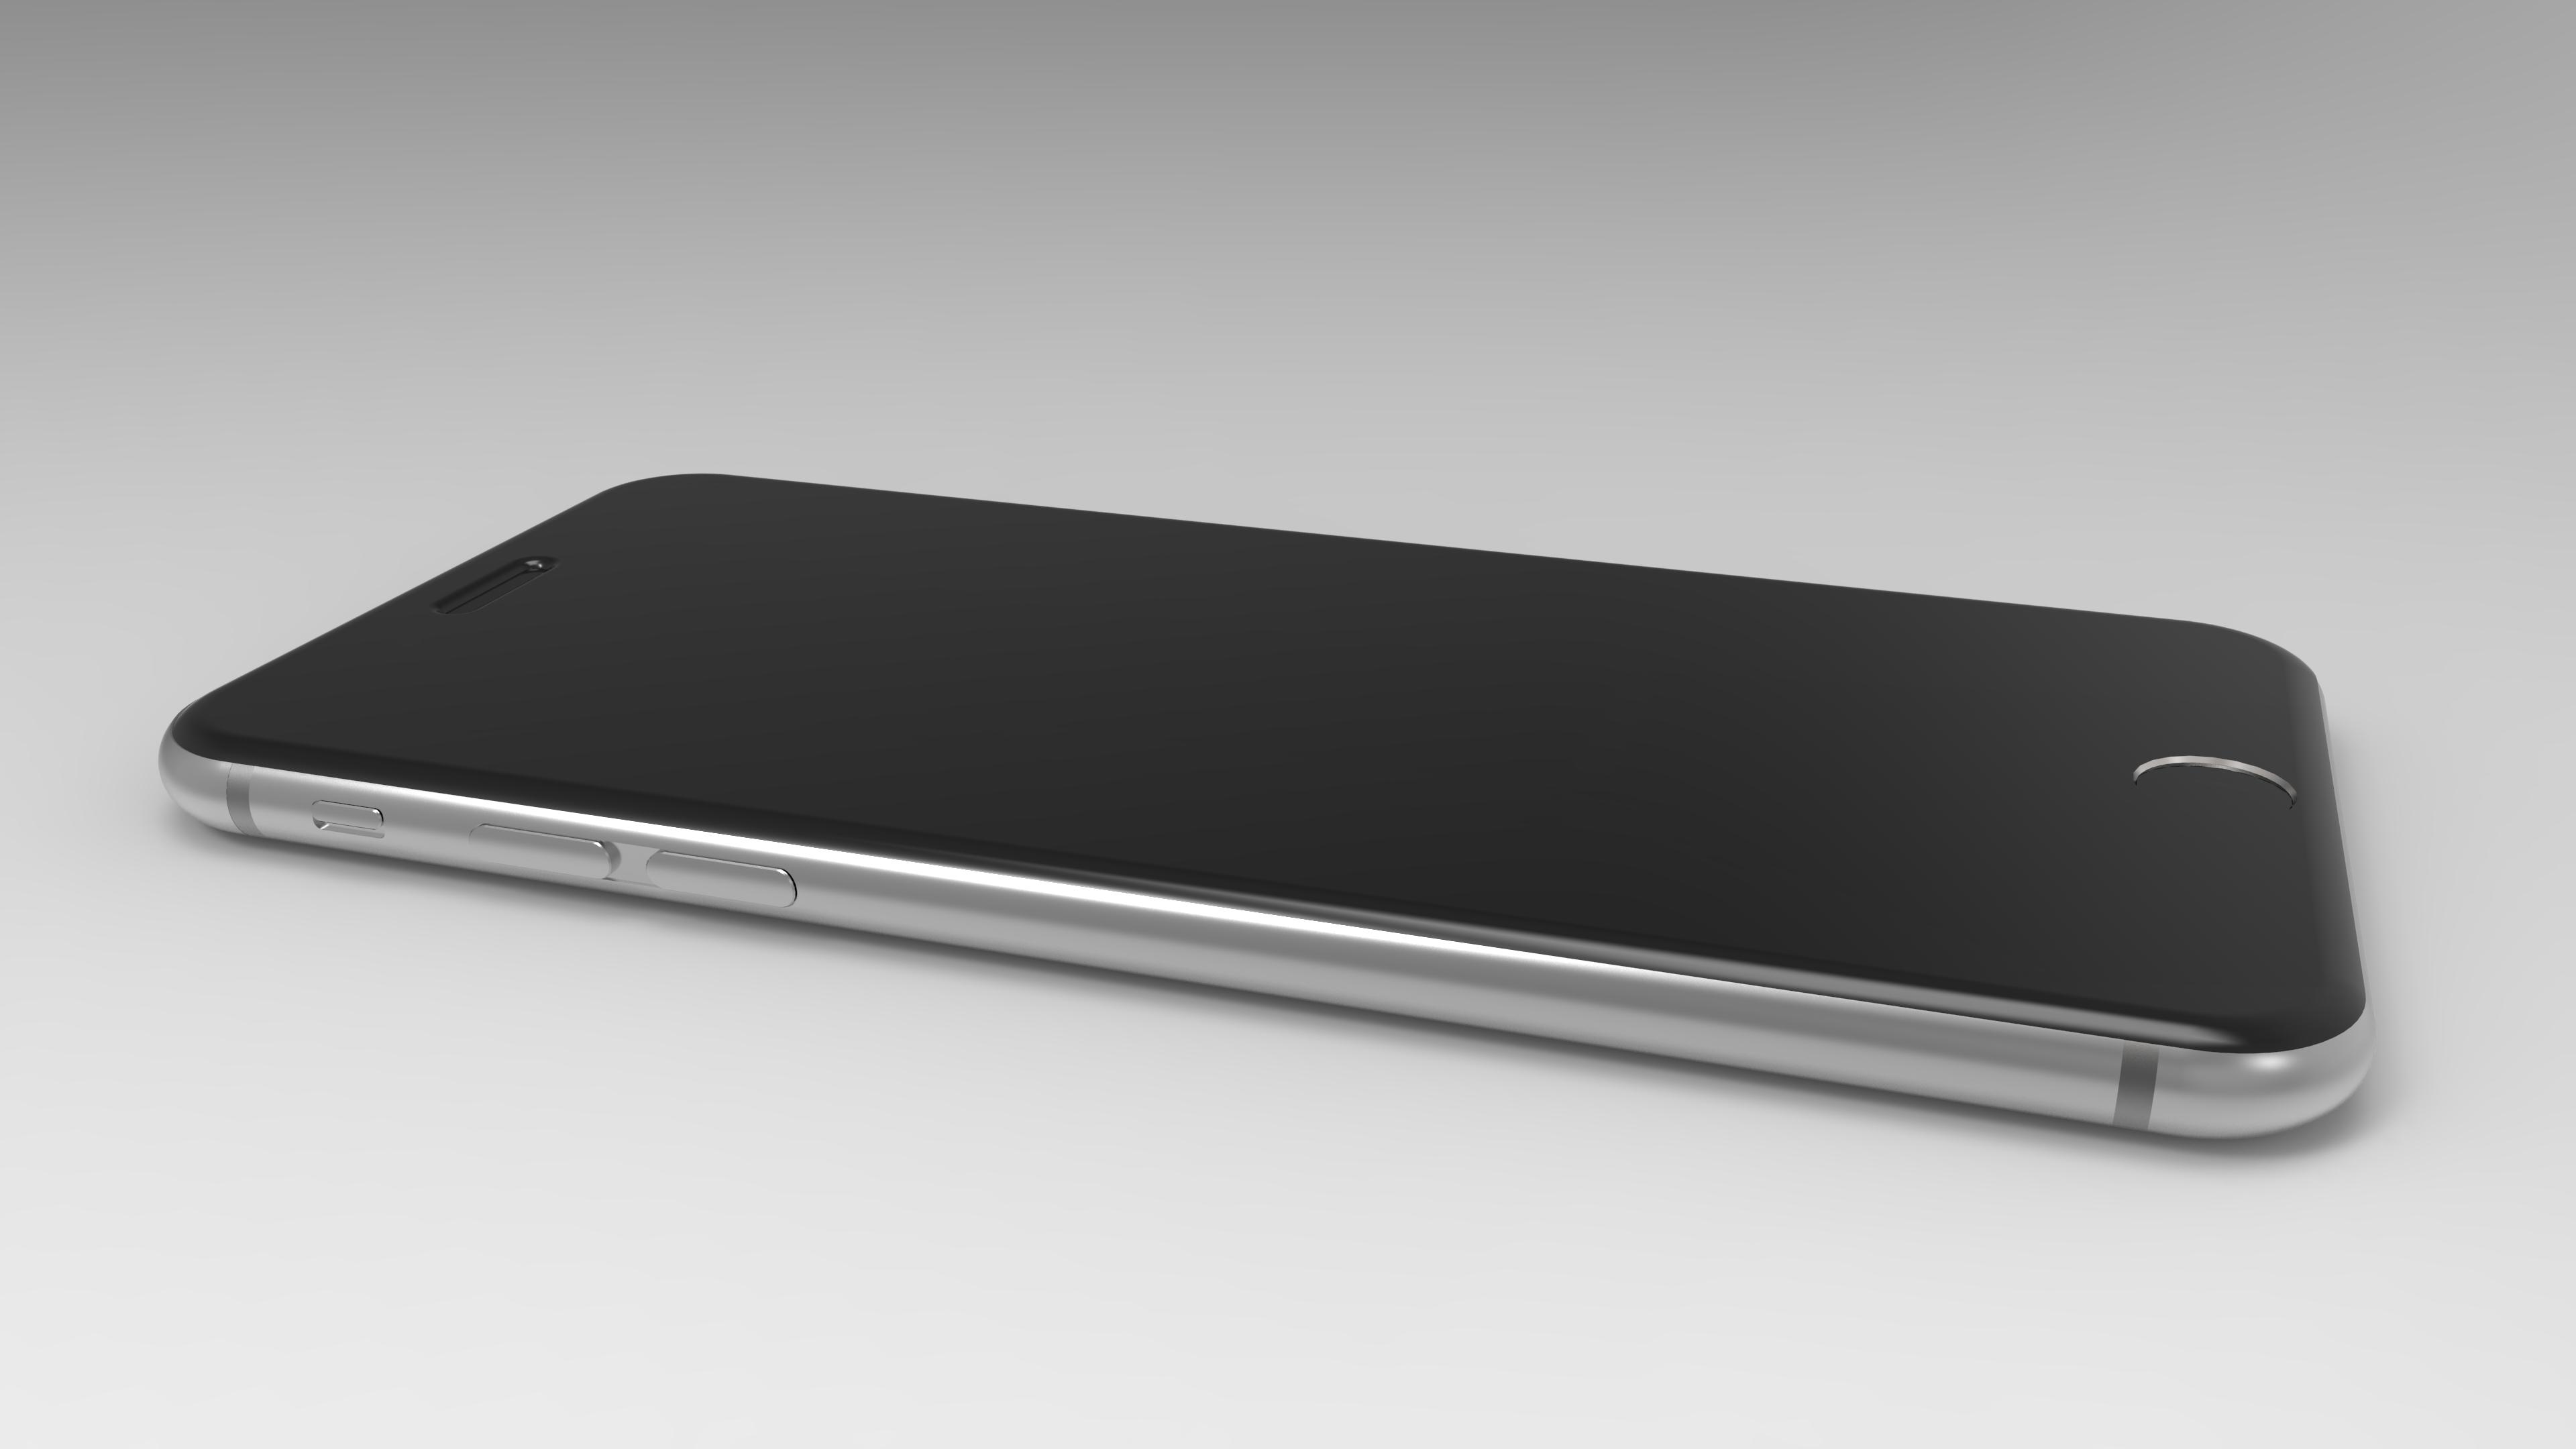 iPhone-6-3840x2160_4K.jpg